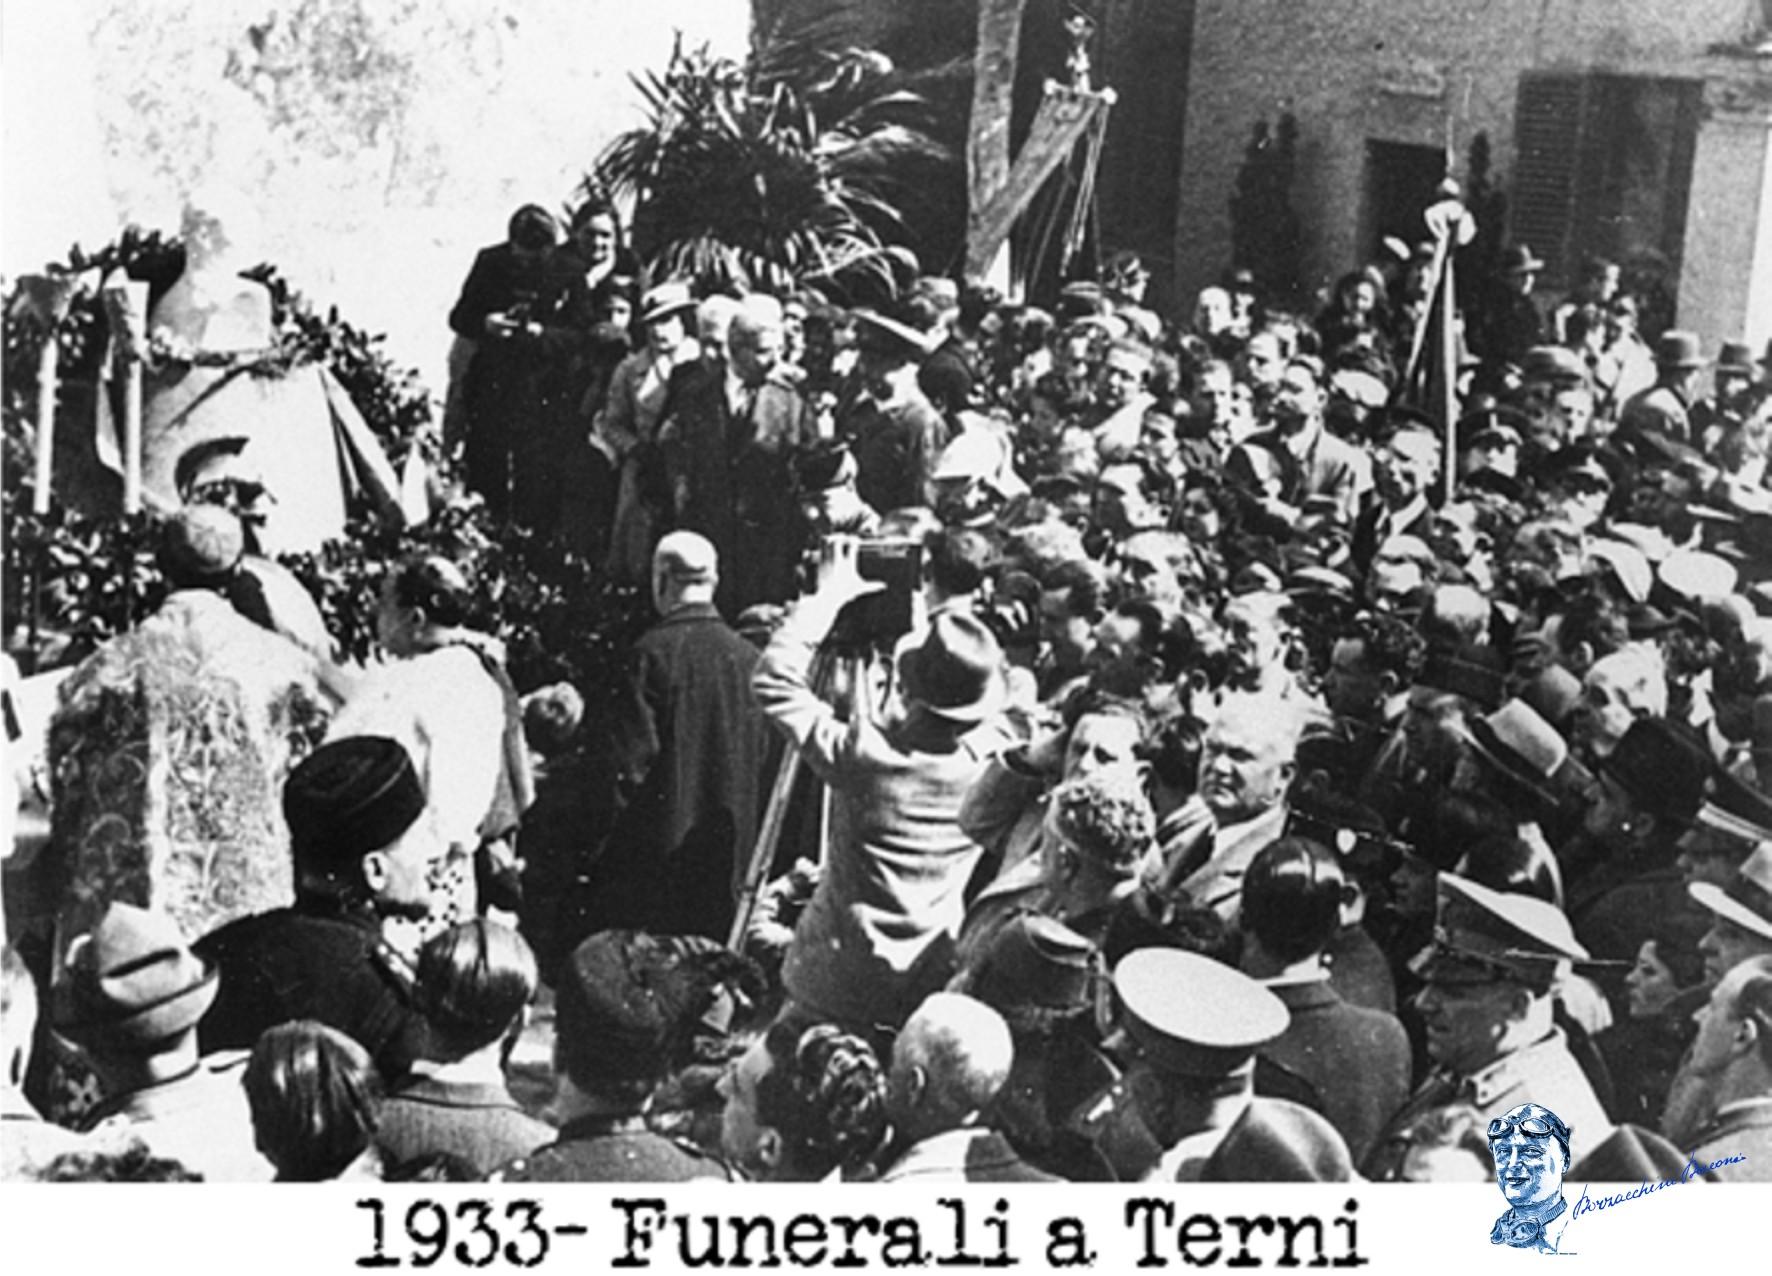 Backup_di_1933 funerali borzacchini terni 6